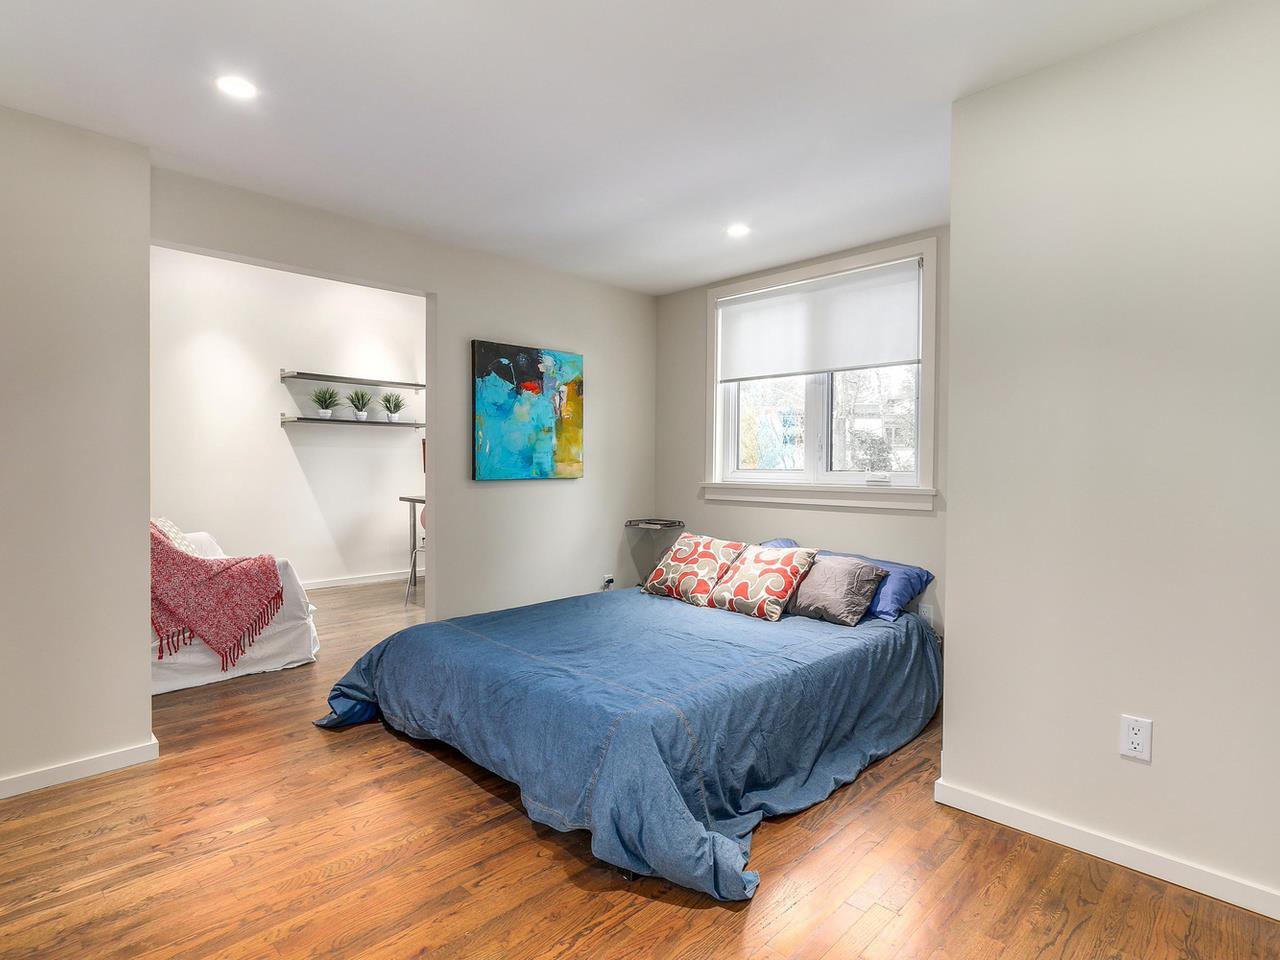 Photo 18: Photos: 3708 EDGEMONT Boulevard in North Vancouver: Edgemont House Fourplex for sale : MLS®# R2138514